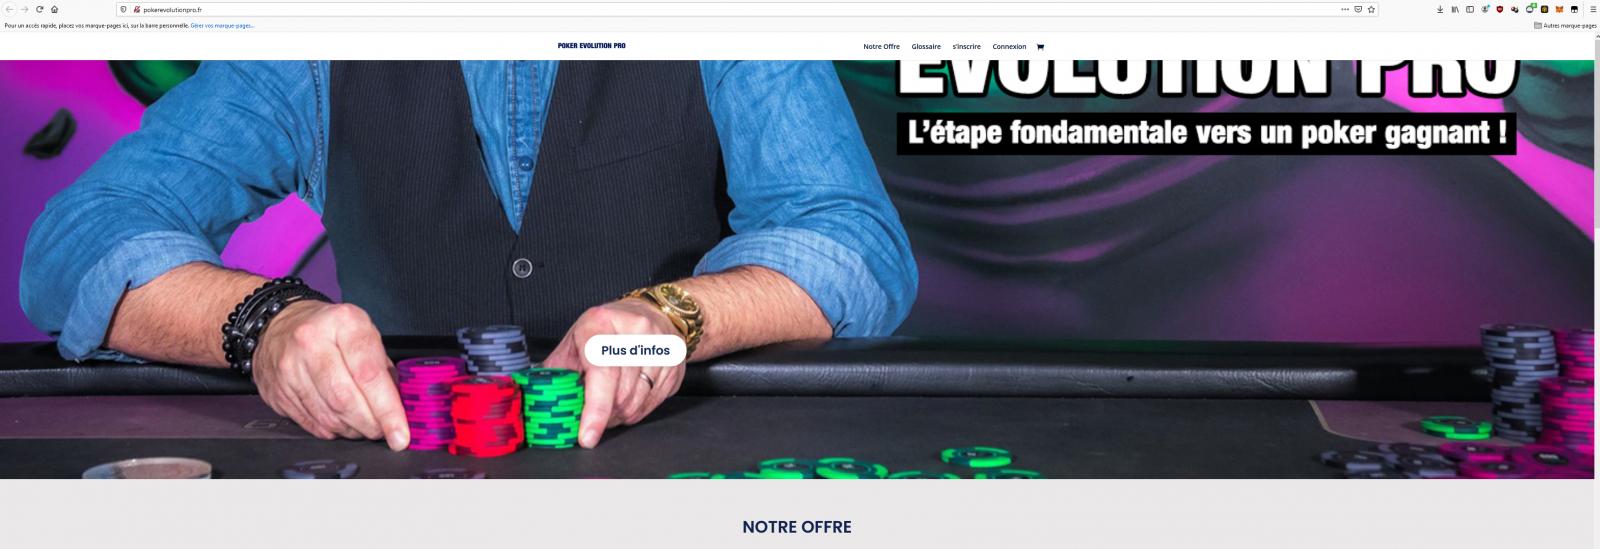 pokerrevolutionpro.png